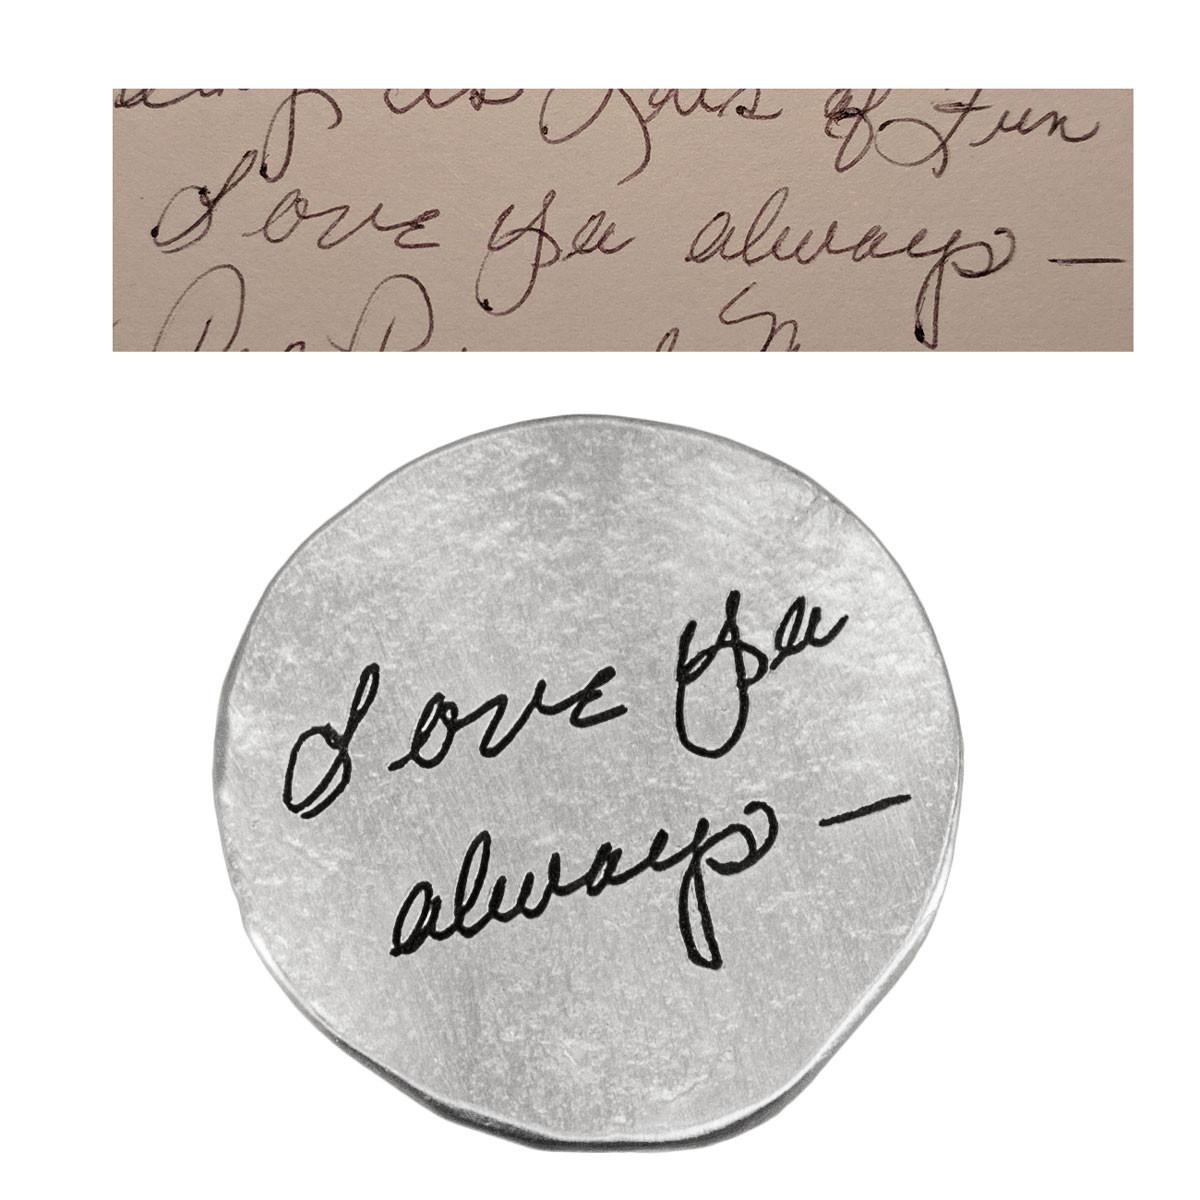 Handwritten note on fine pewter pocket token charm, showing actual handwriting